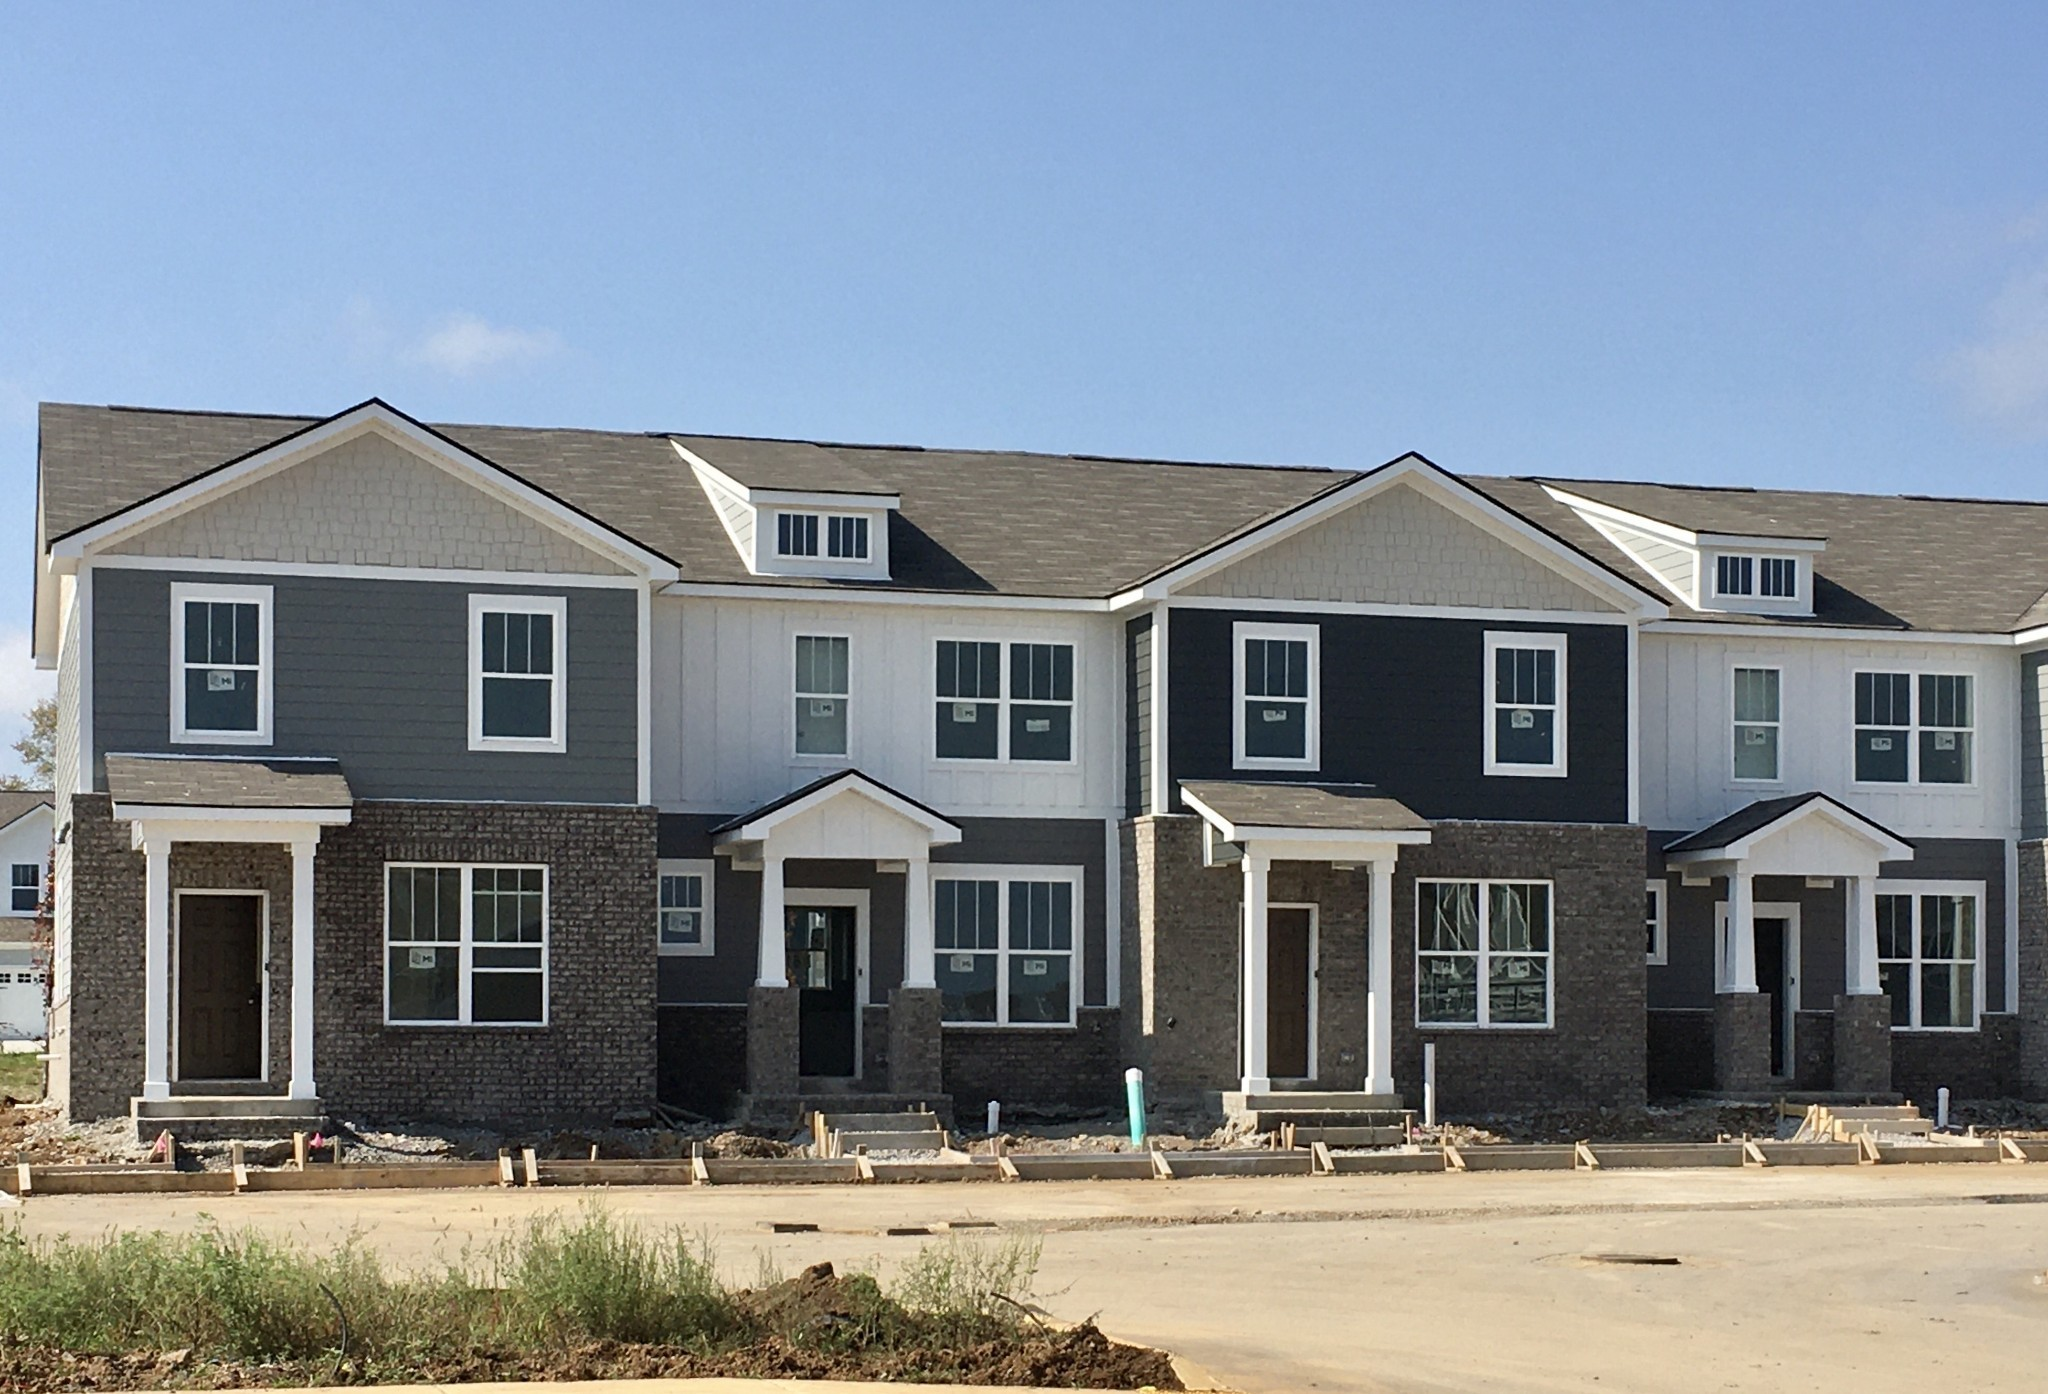 1715 Frodo Way (85 S) #85 Property Photo - Murfreesboro, TN real estate listing